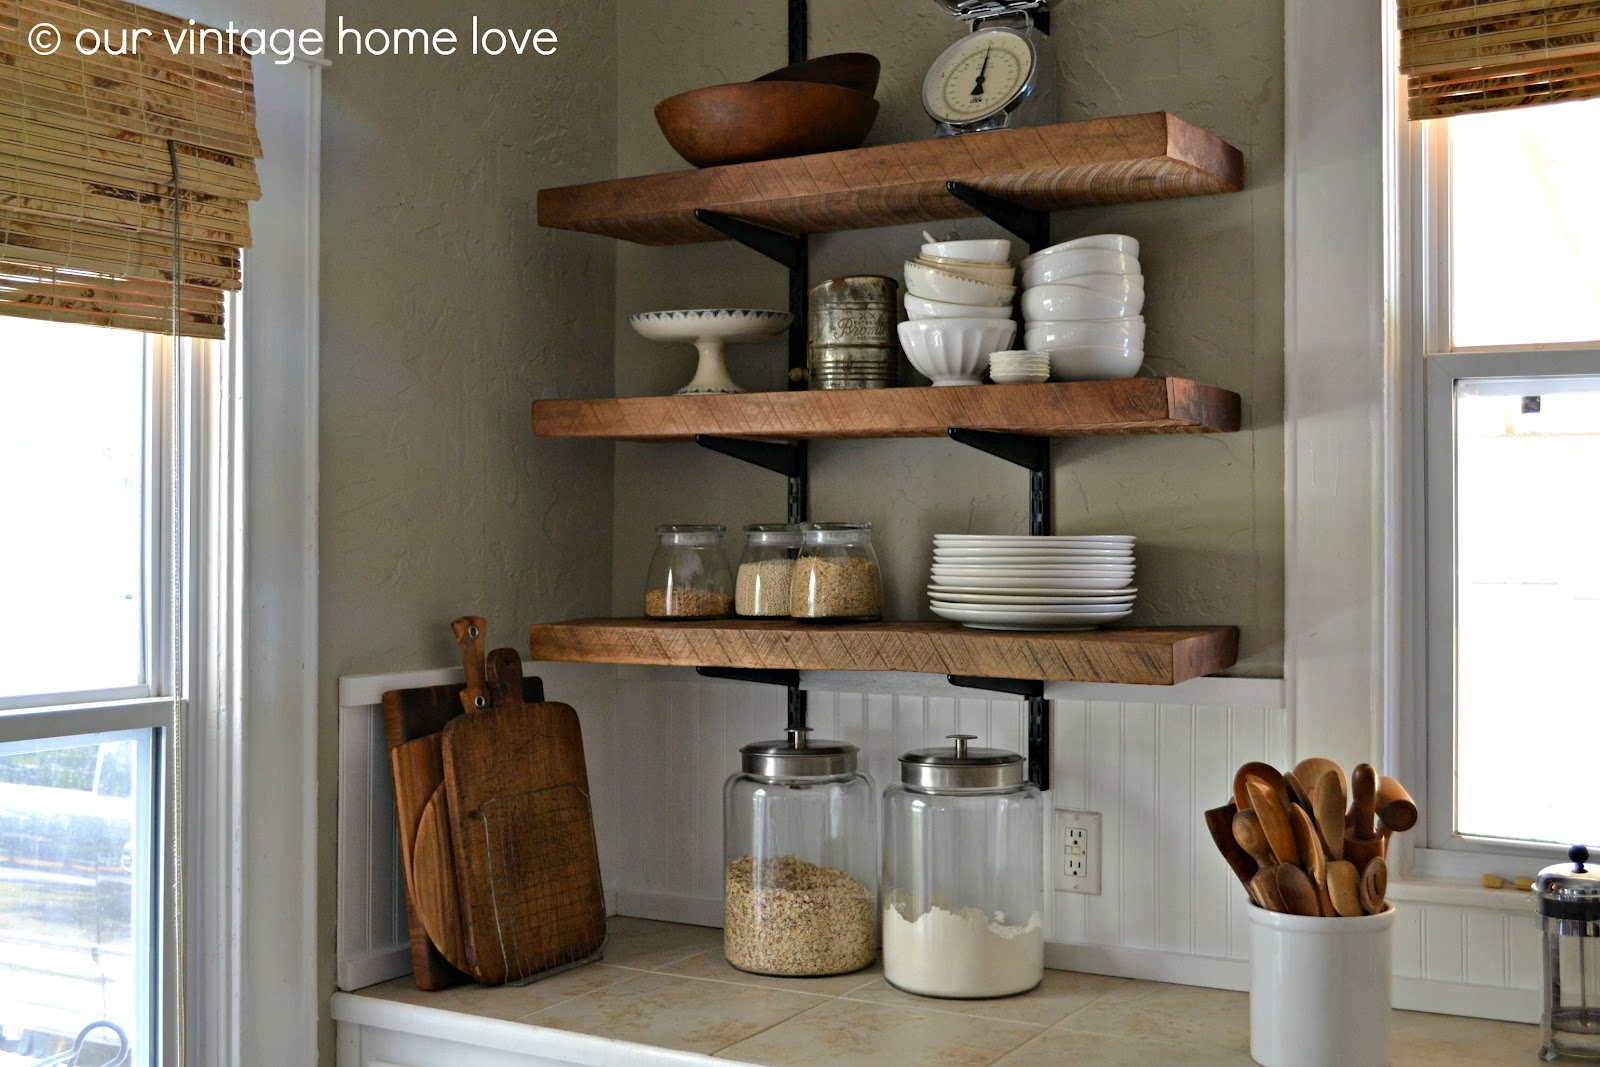 kitchen wall shelf wood hoods vintage home love reclaimed shelving reveal